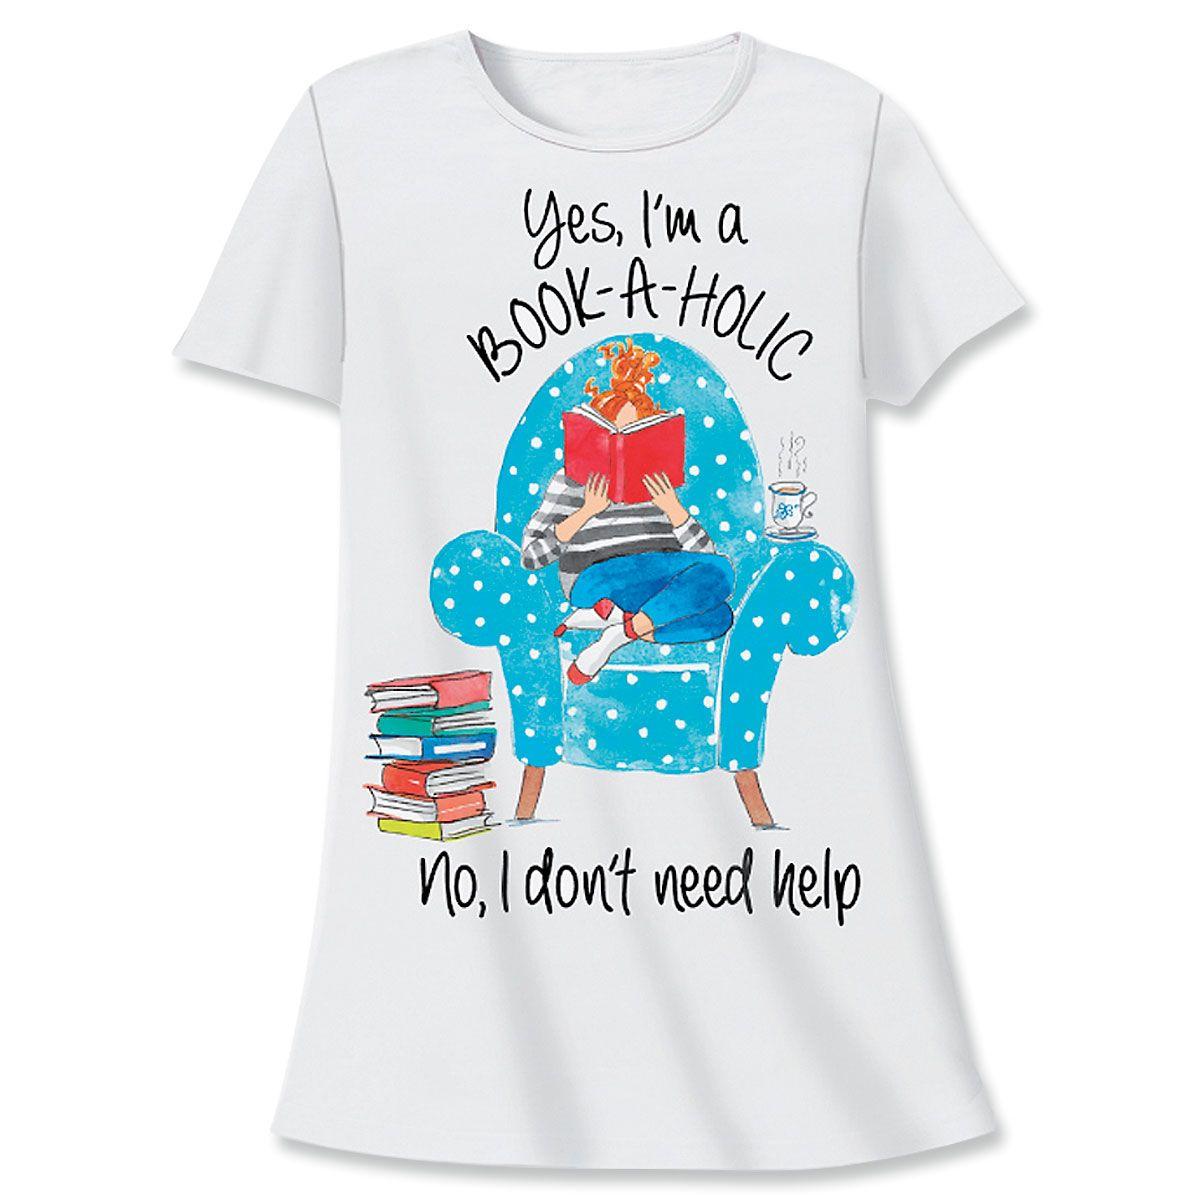 Book-a-holic Nightshirt